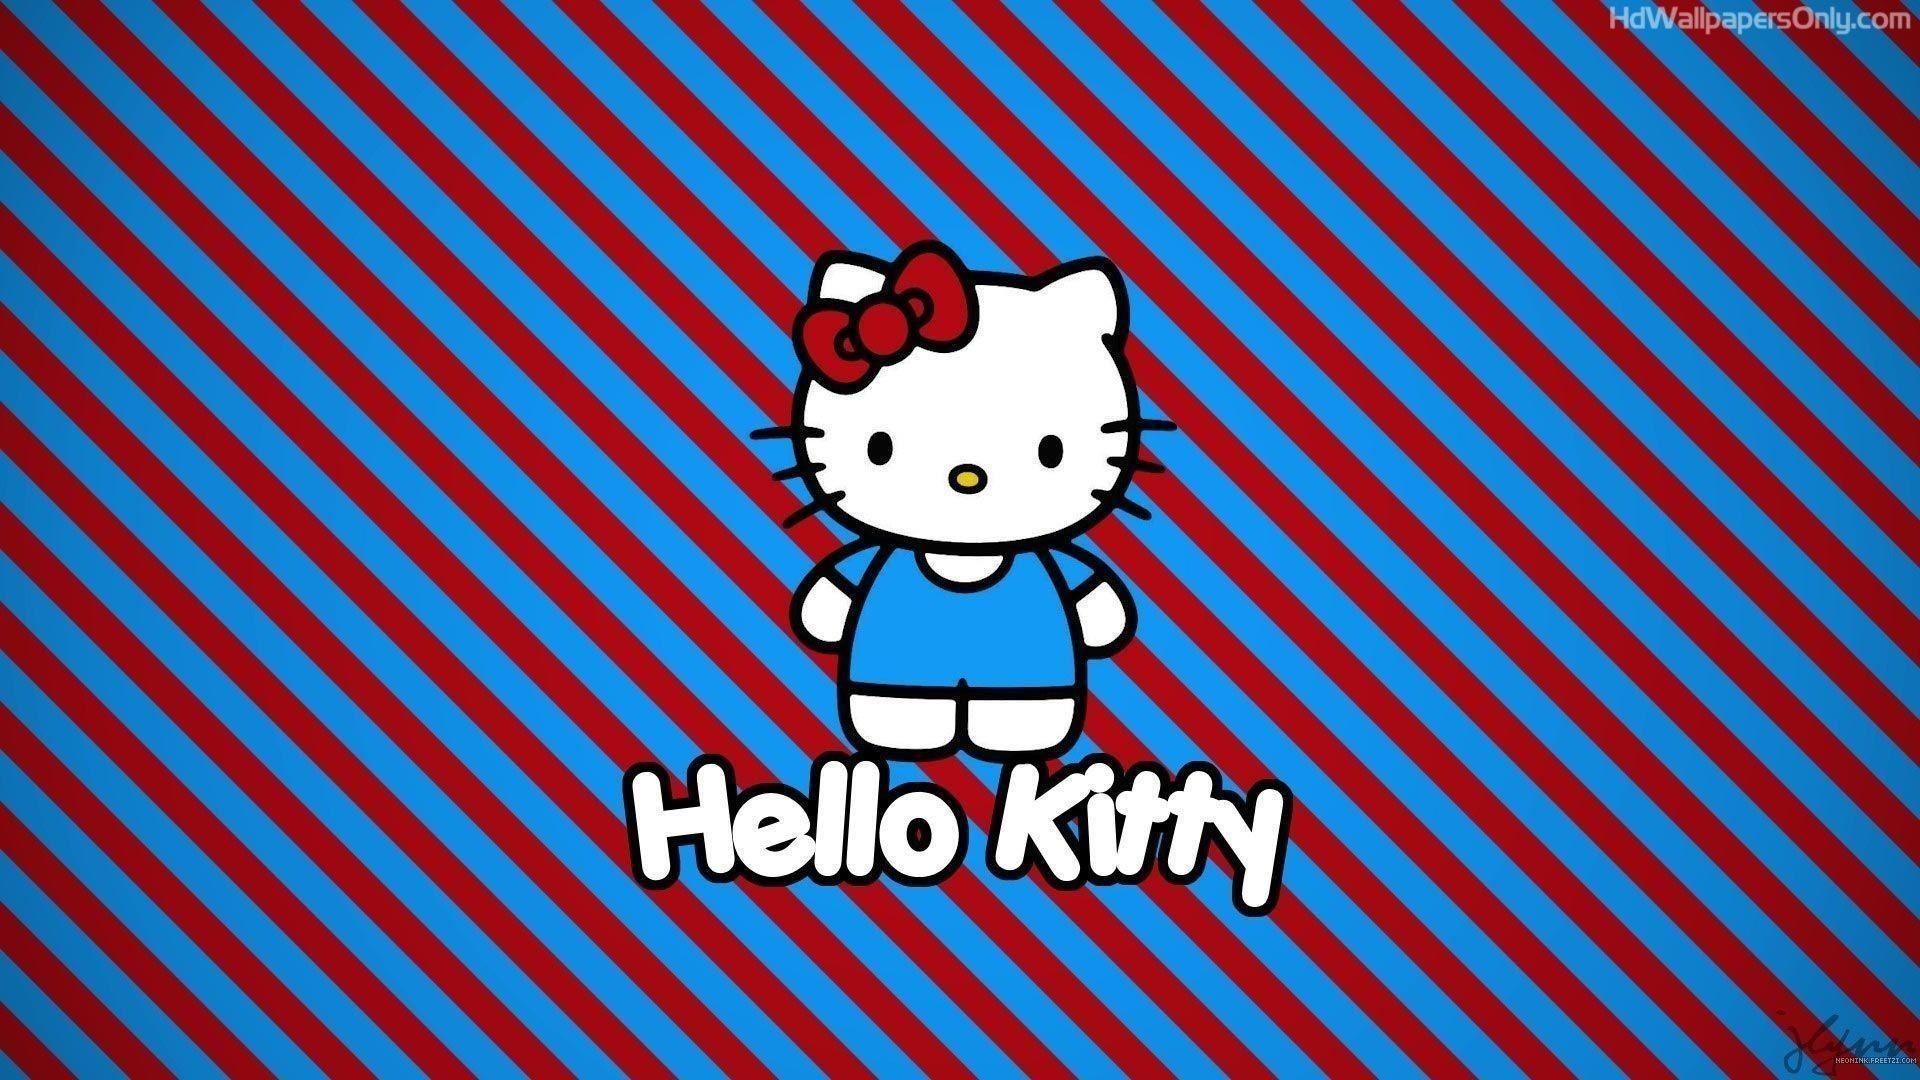 Wonderful Wallpaper Hello Kitty Dark Pink - 691695-widescreen-black-hello-kitty-background-1920x1080-samsung-galaxy  Pic_246371.jpg